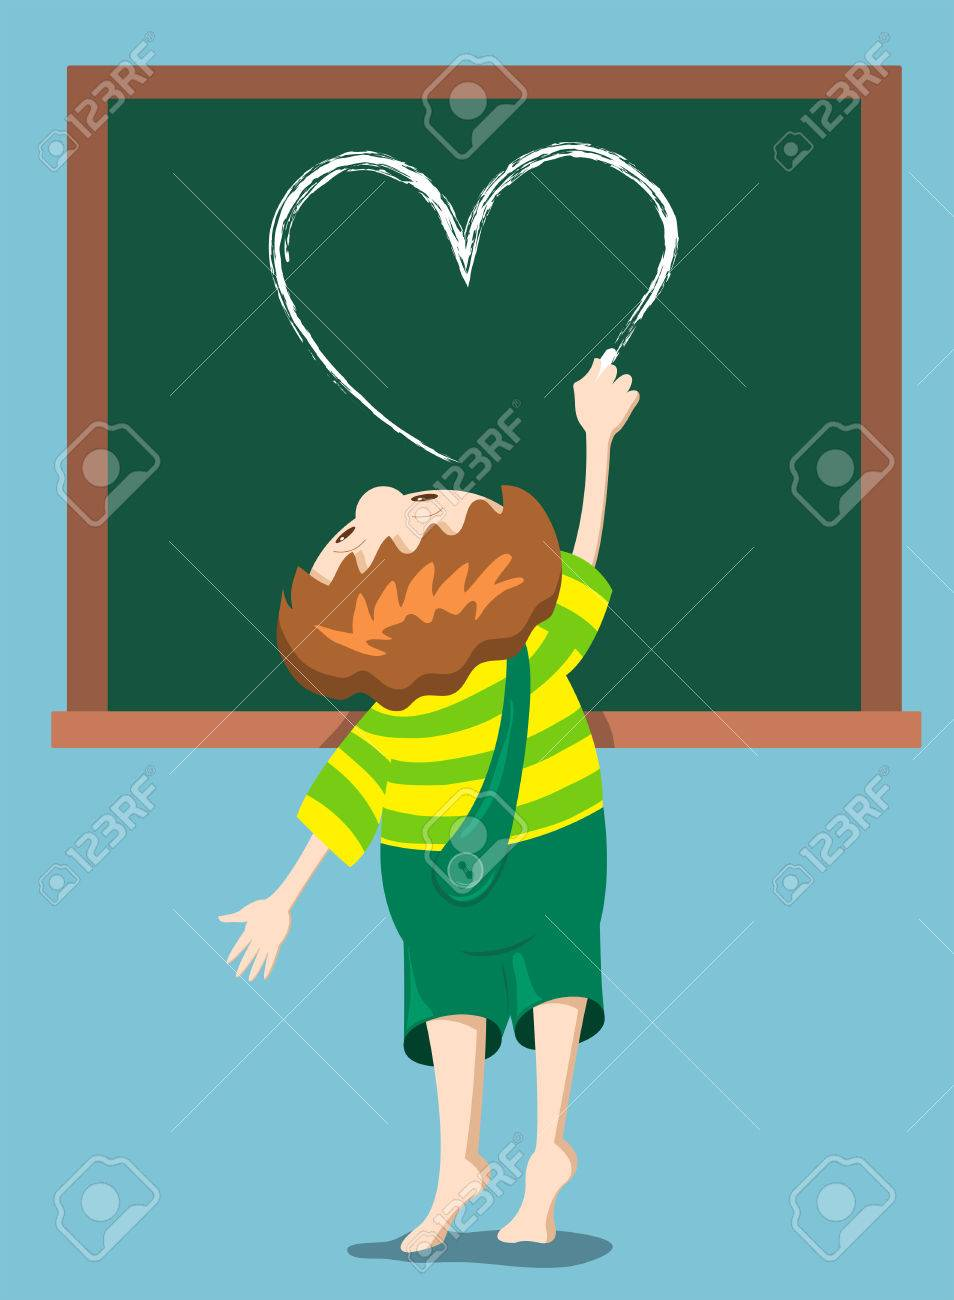 The boy draws heart on the blackboard. Cartoon illustration. Stock Vector - 7929505